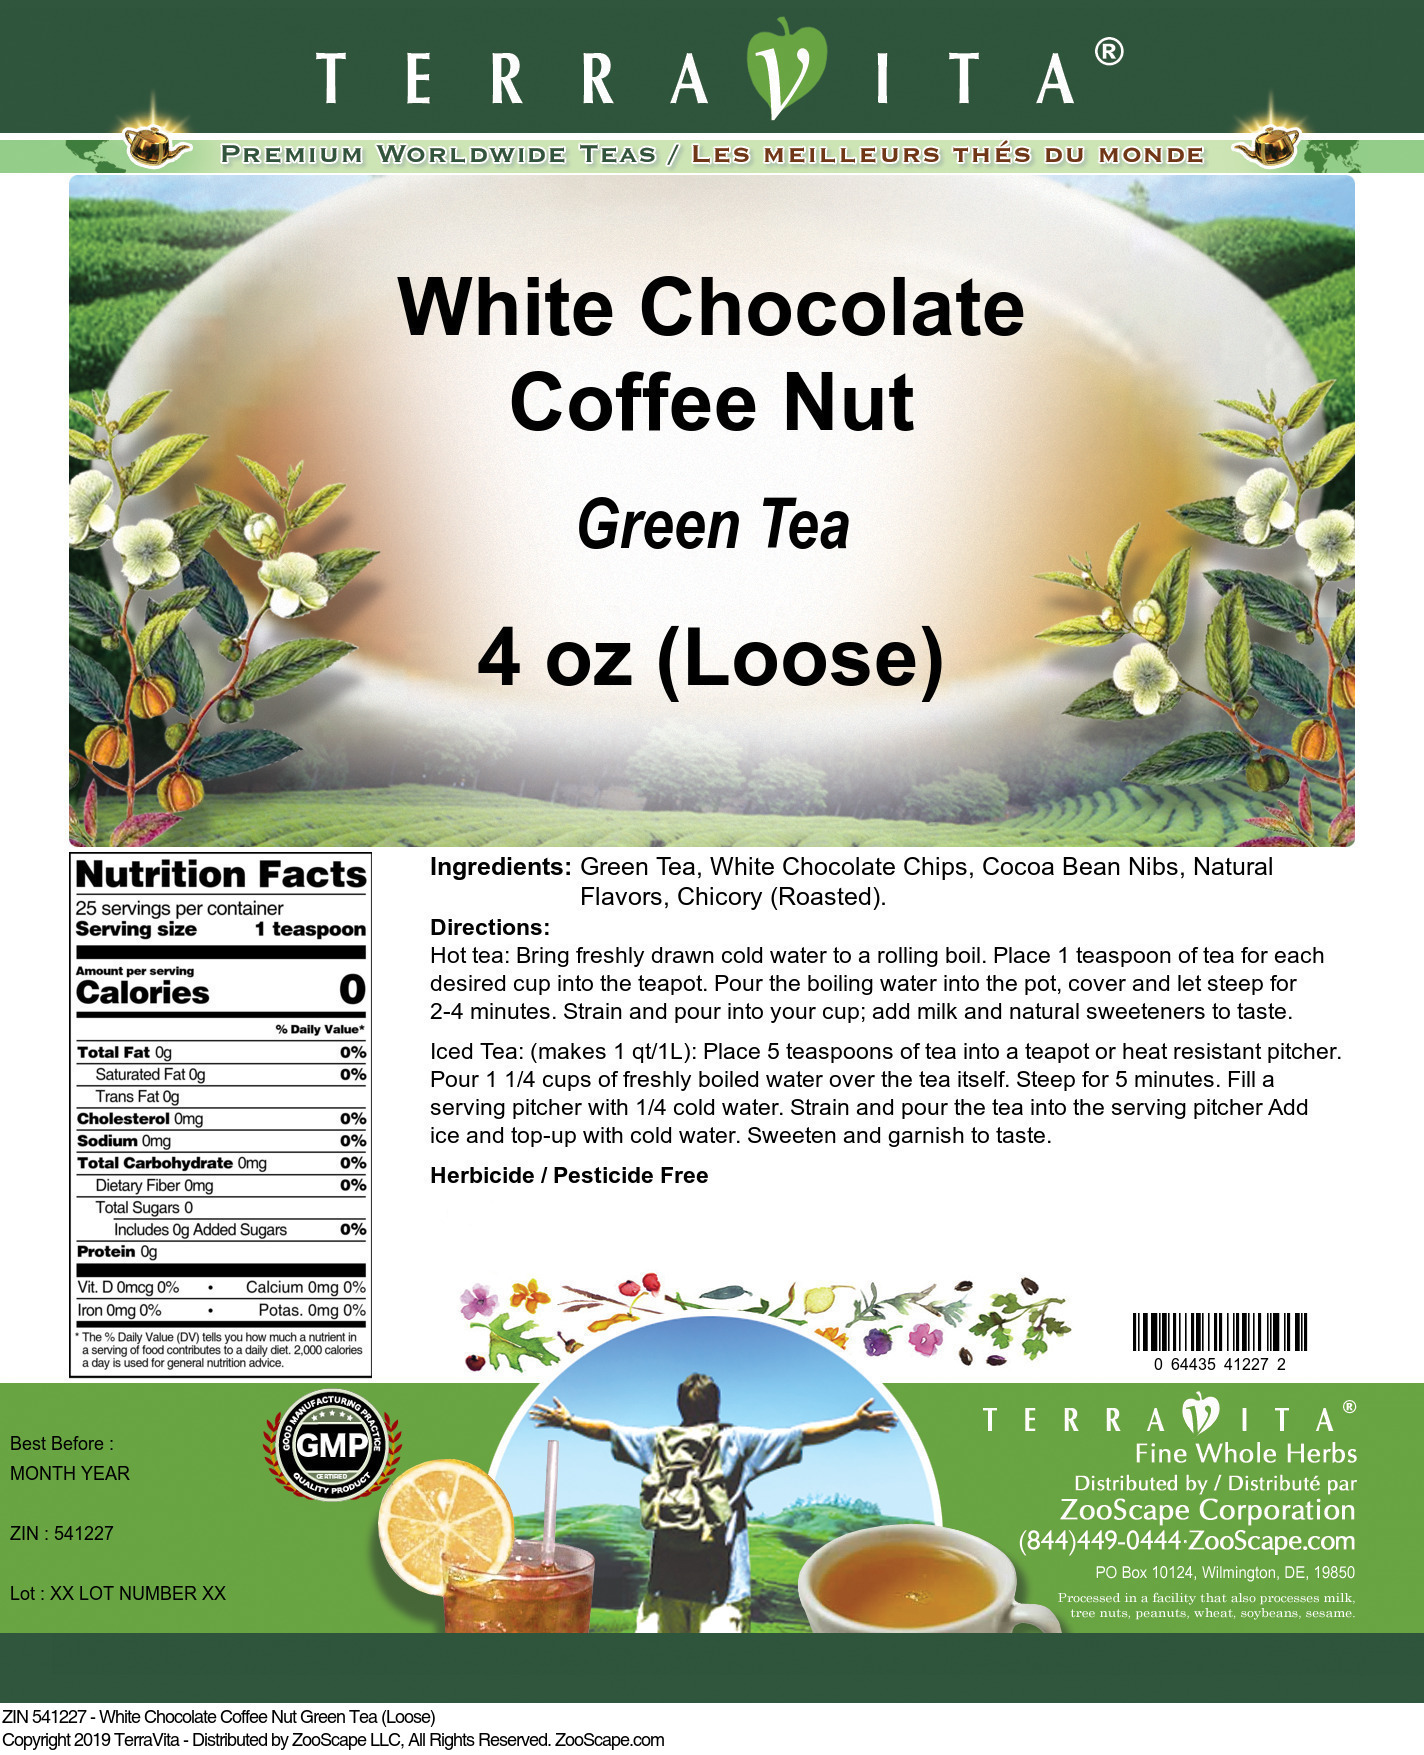 White Chocolate Coffee Nut Green Tea (Loose)